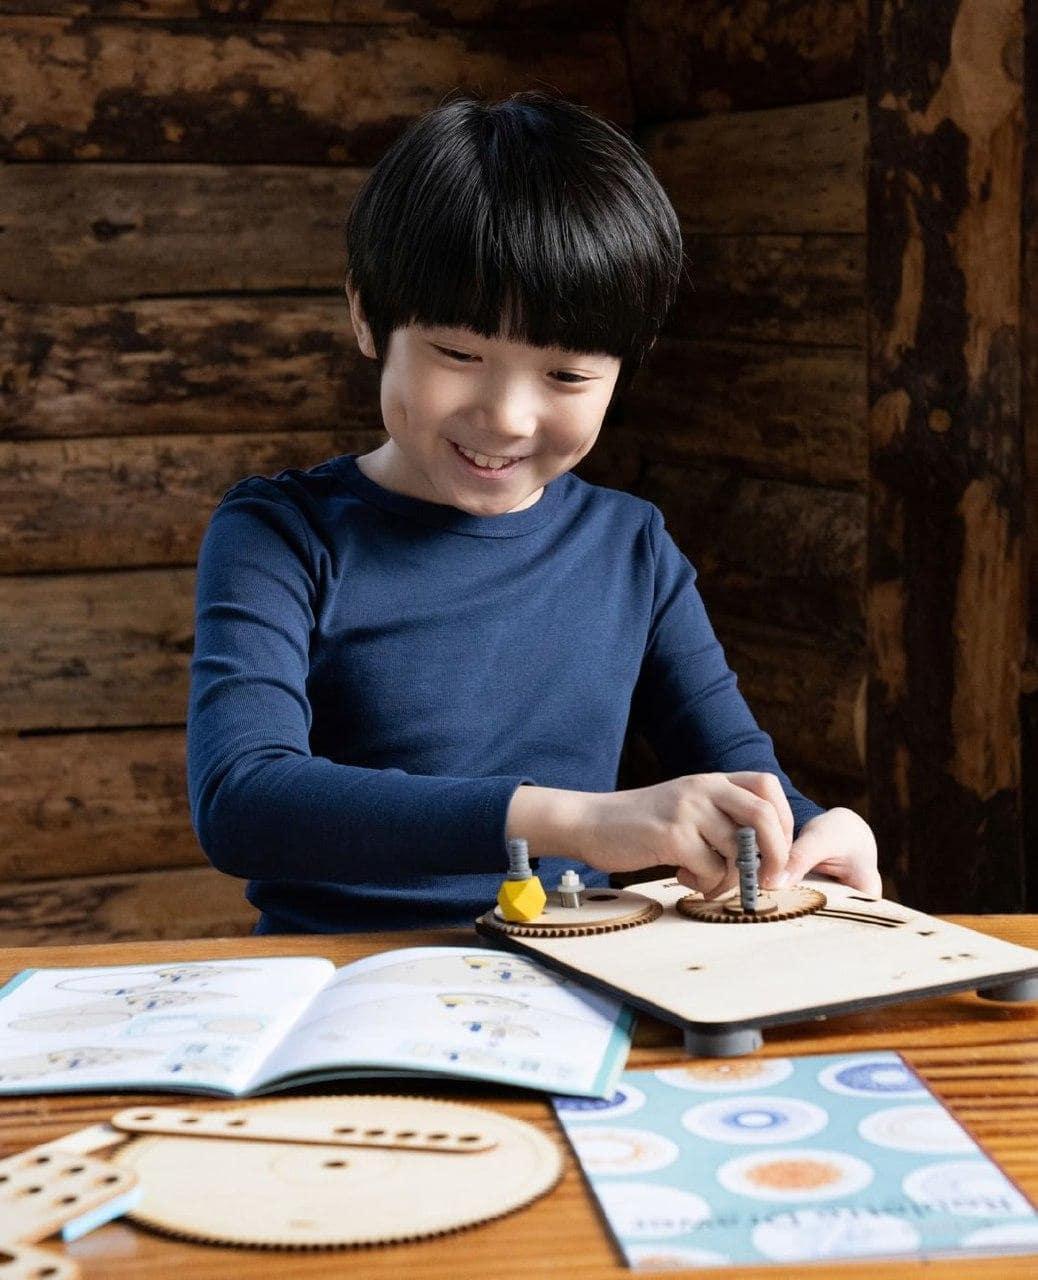 Tinkerer Craft Box - Activities for Kids